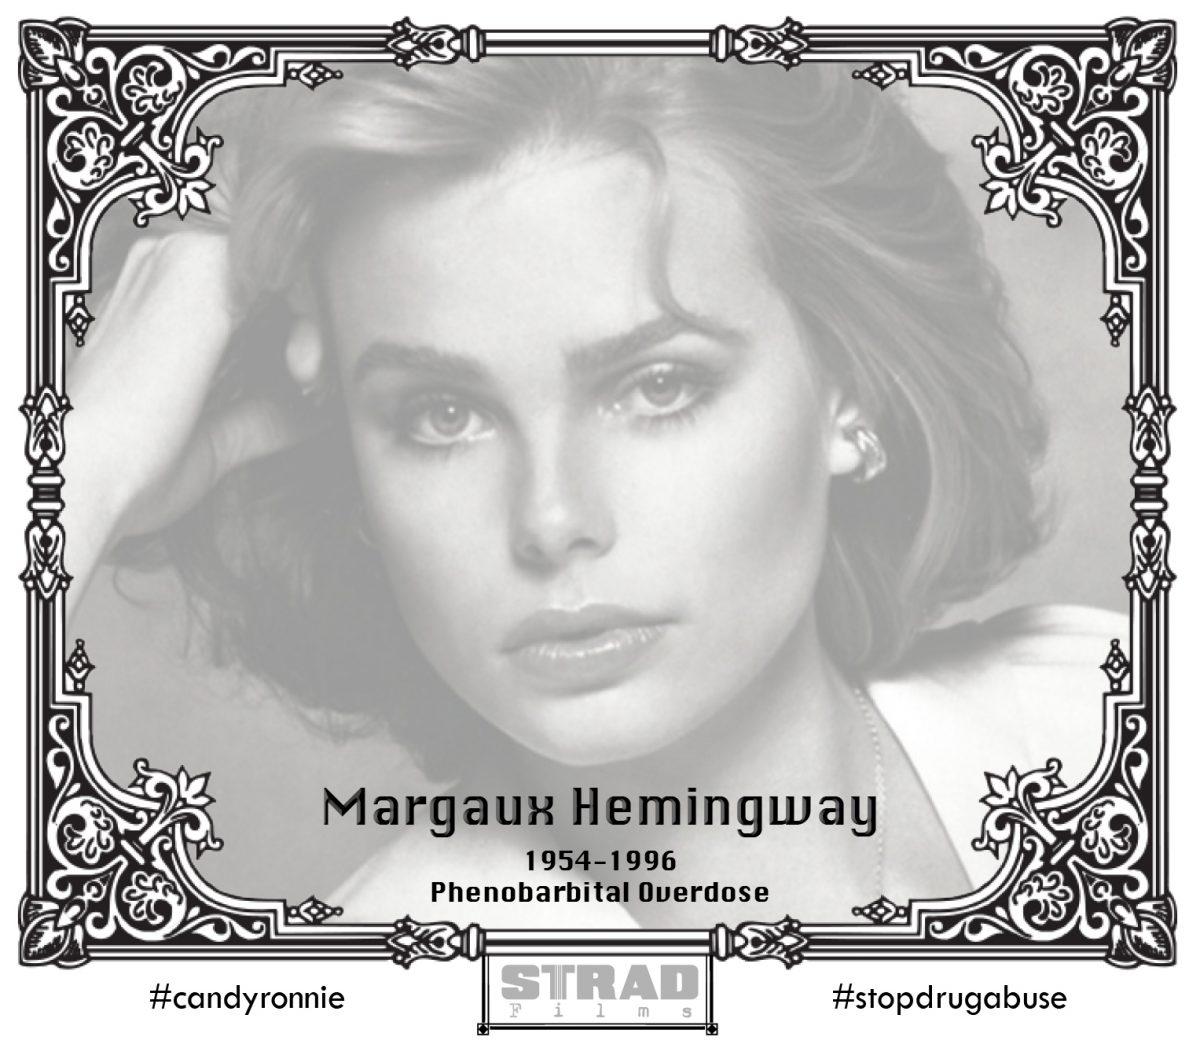 Margeaux Hemingway